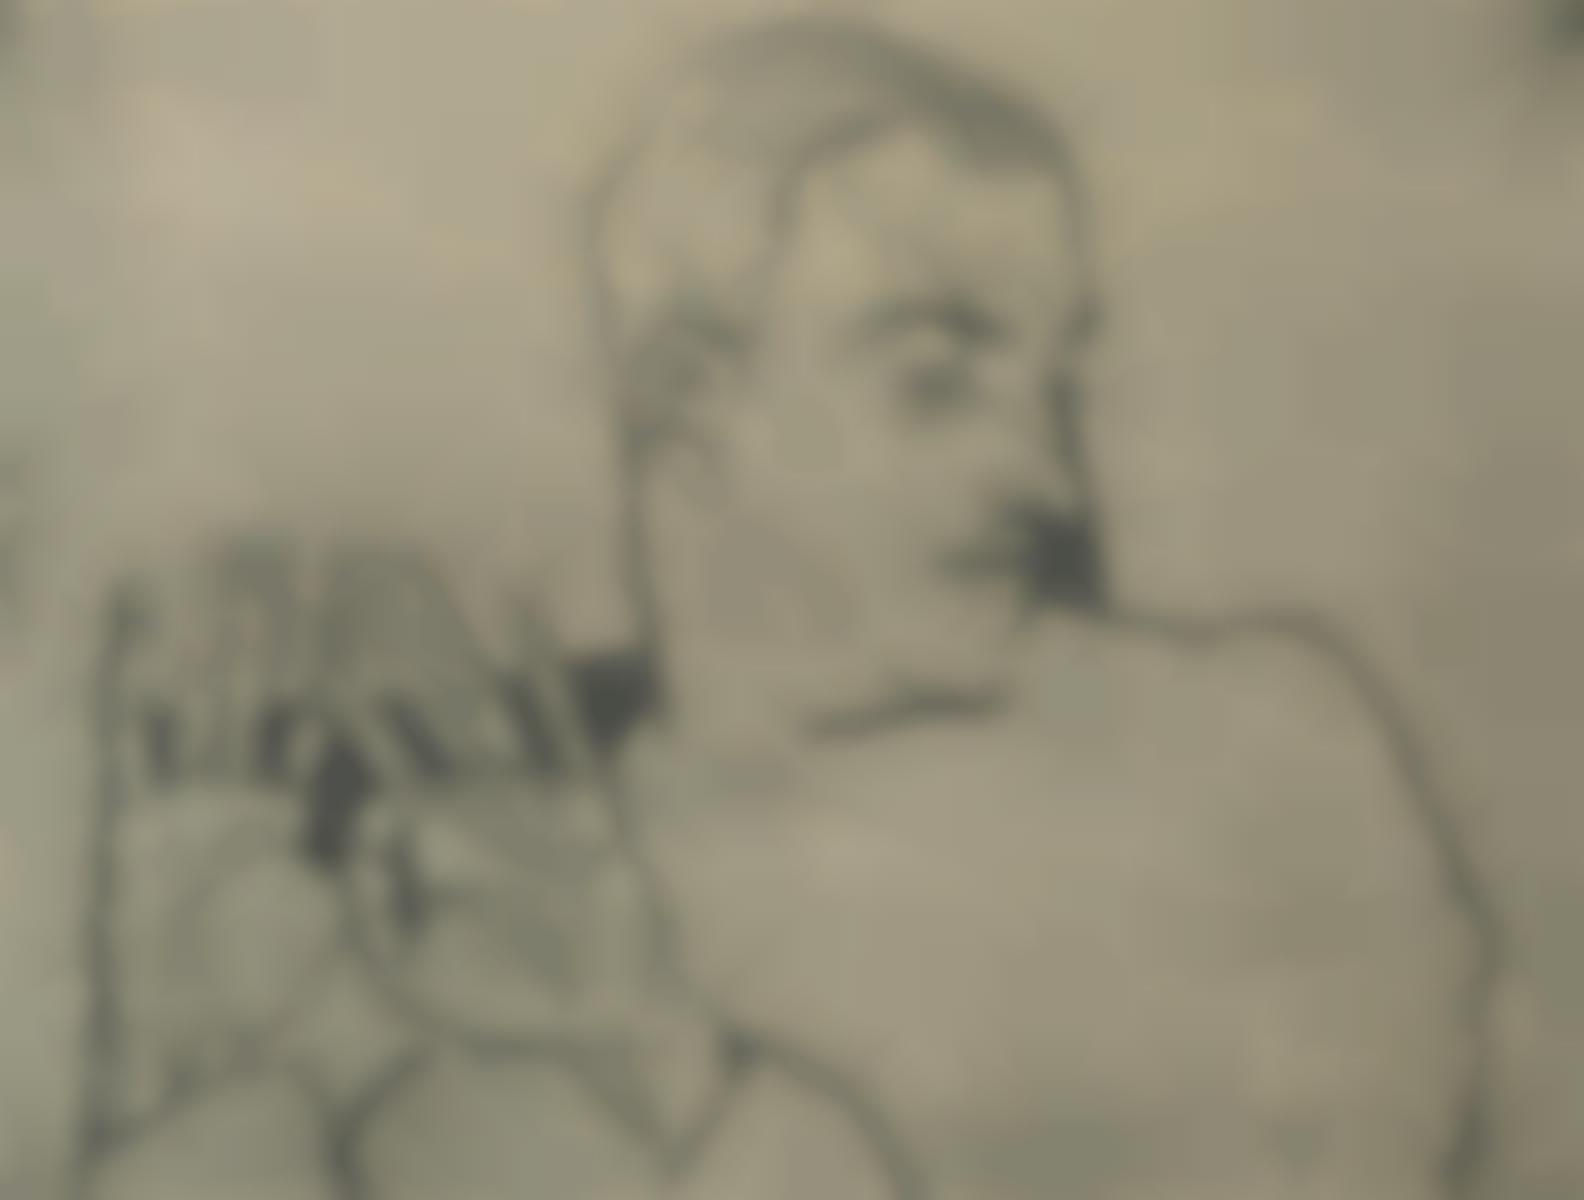 Egon Schiele-Bildnis Arthur Roessler (K. 8B), 1914-1914